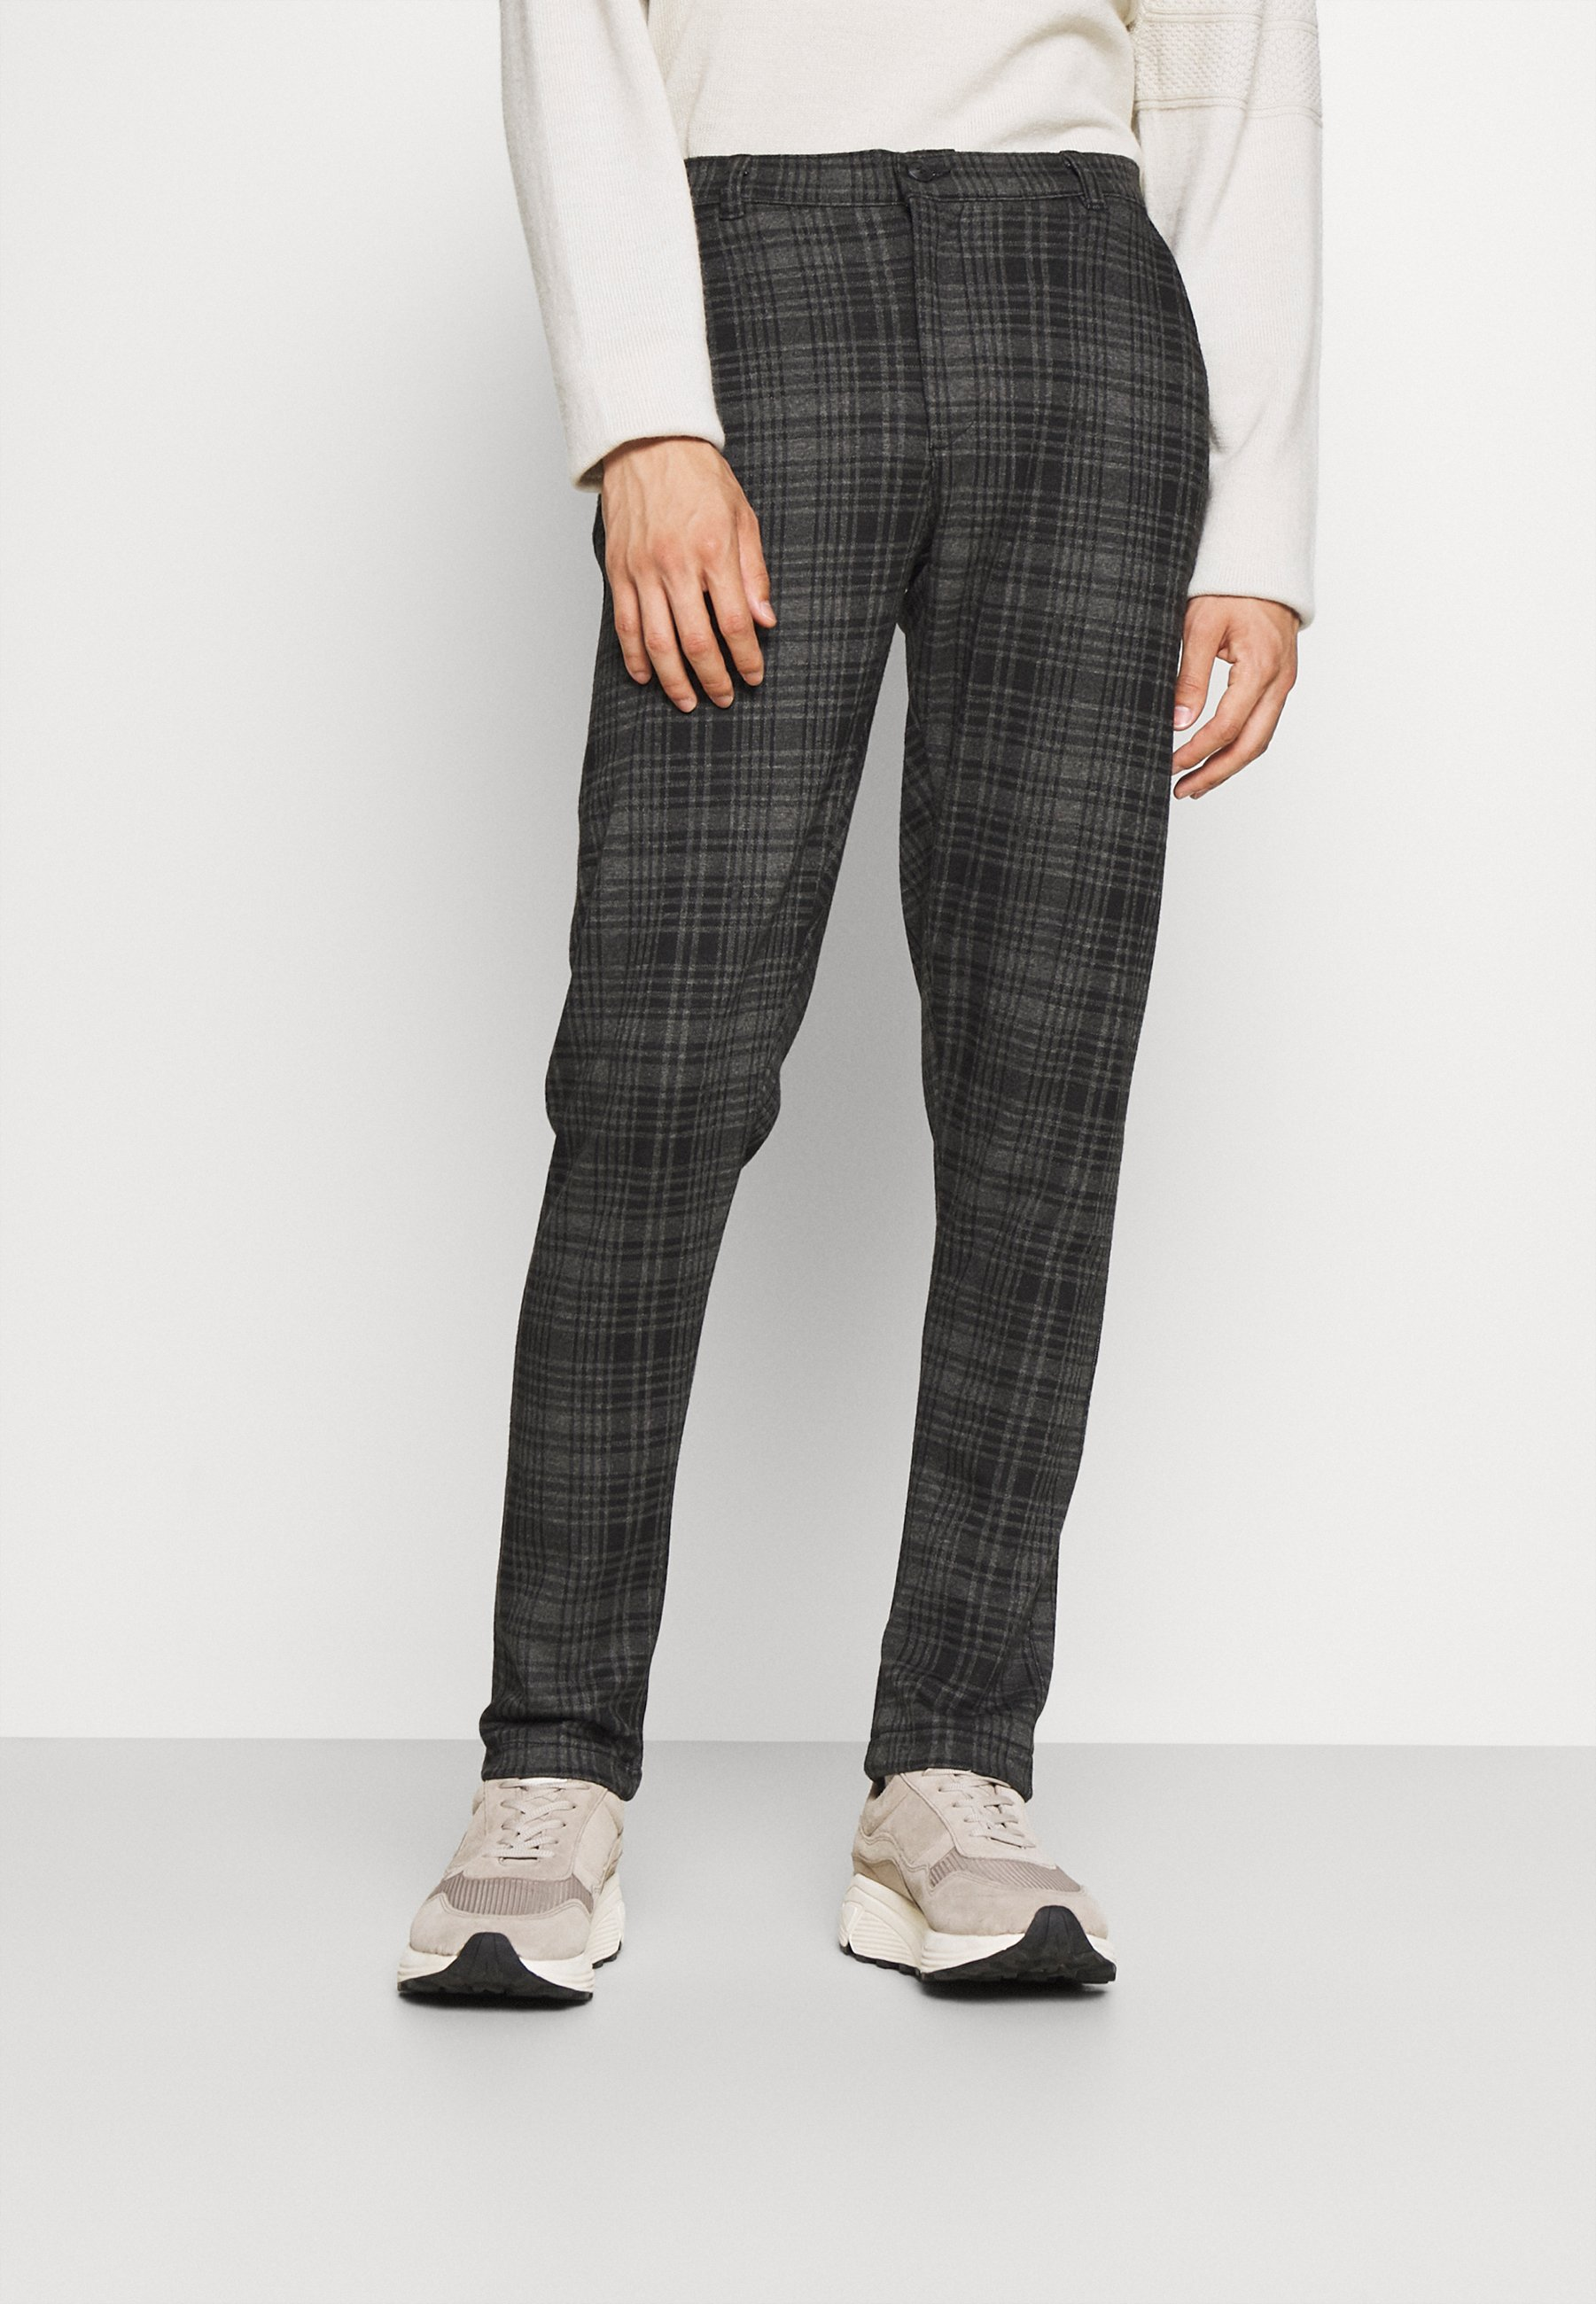 Uomo BARRO CHECK PANTS - Pantaloni